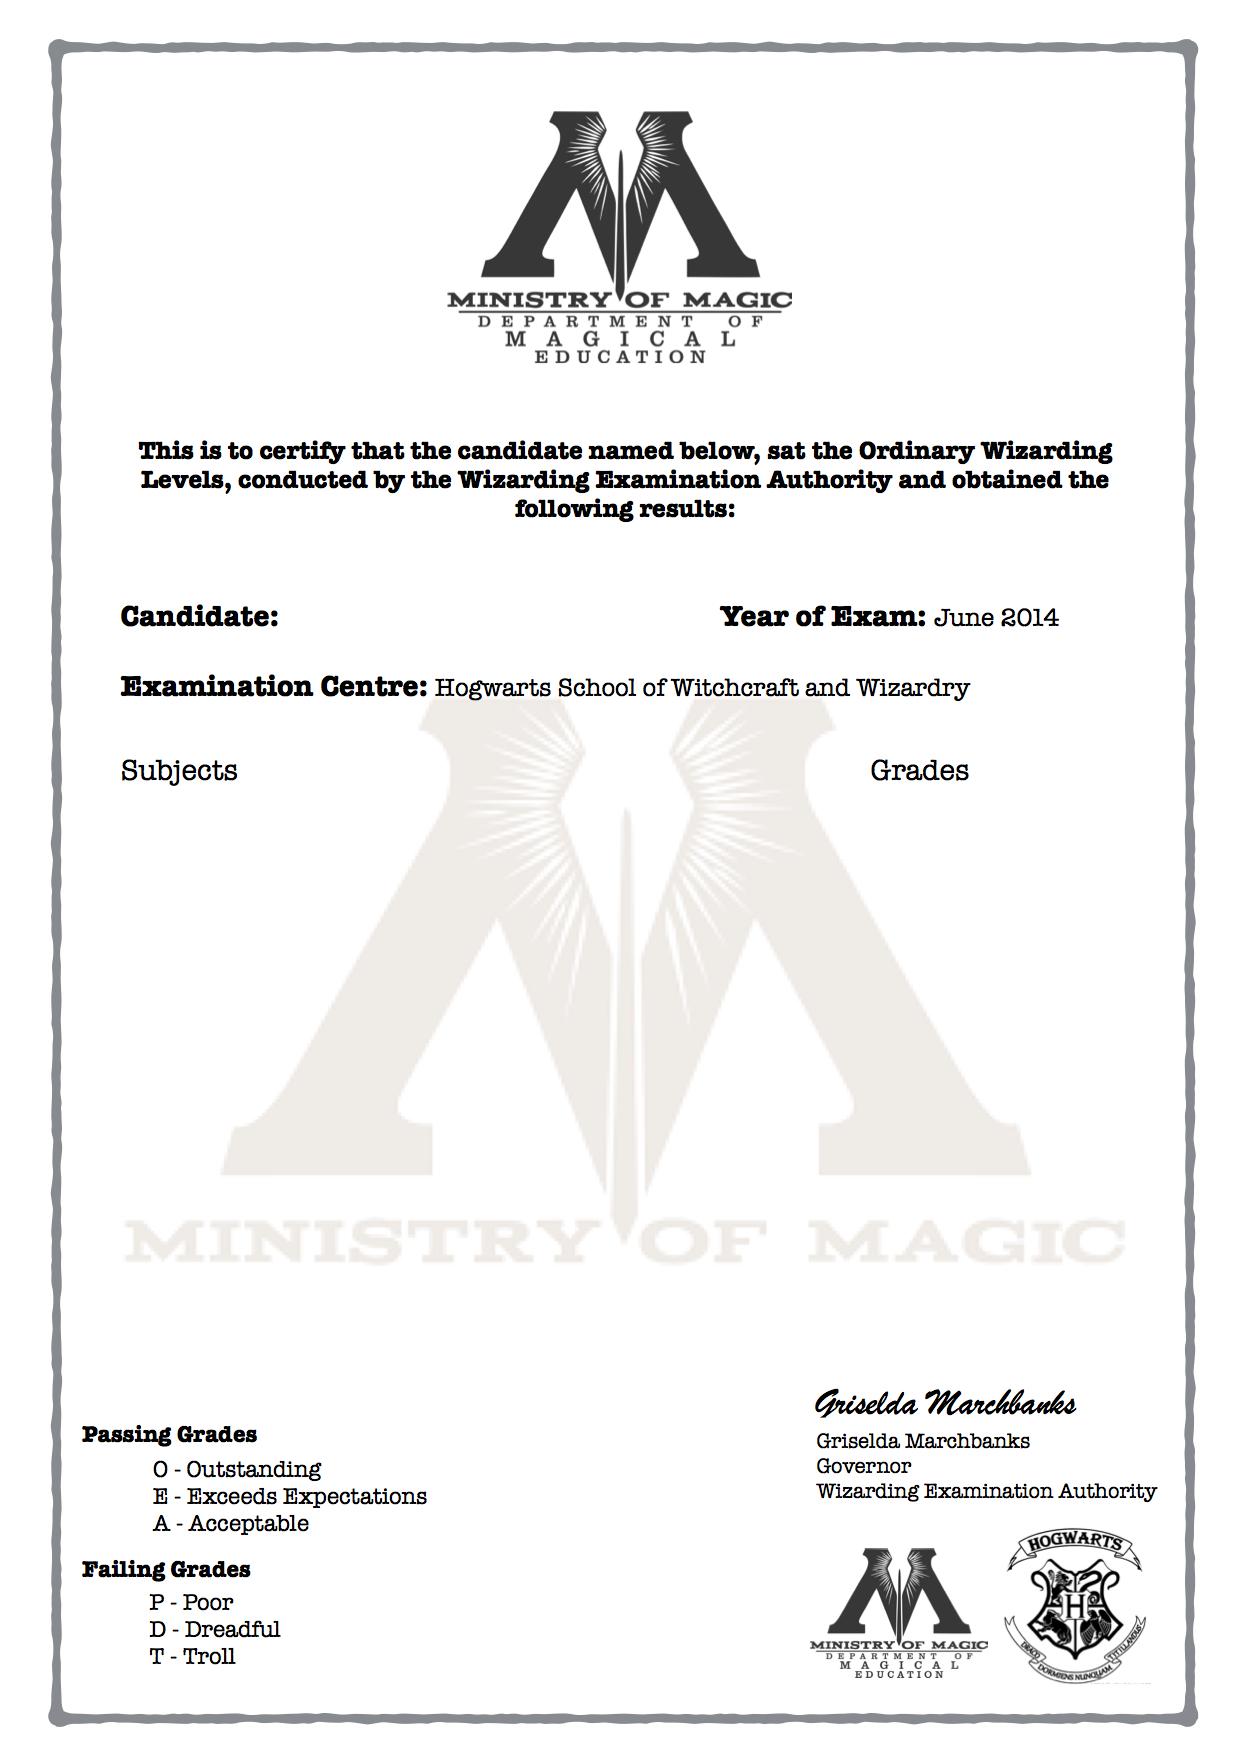 Harry Potter Owl's Certificate Blank Template  Harry Potter Throughout Harry Potter Certificate Template